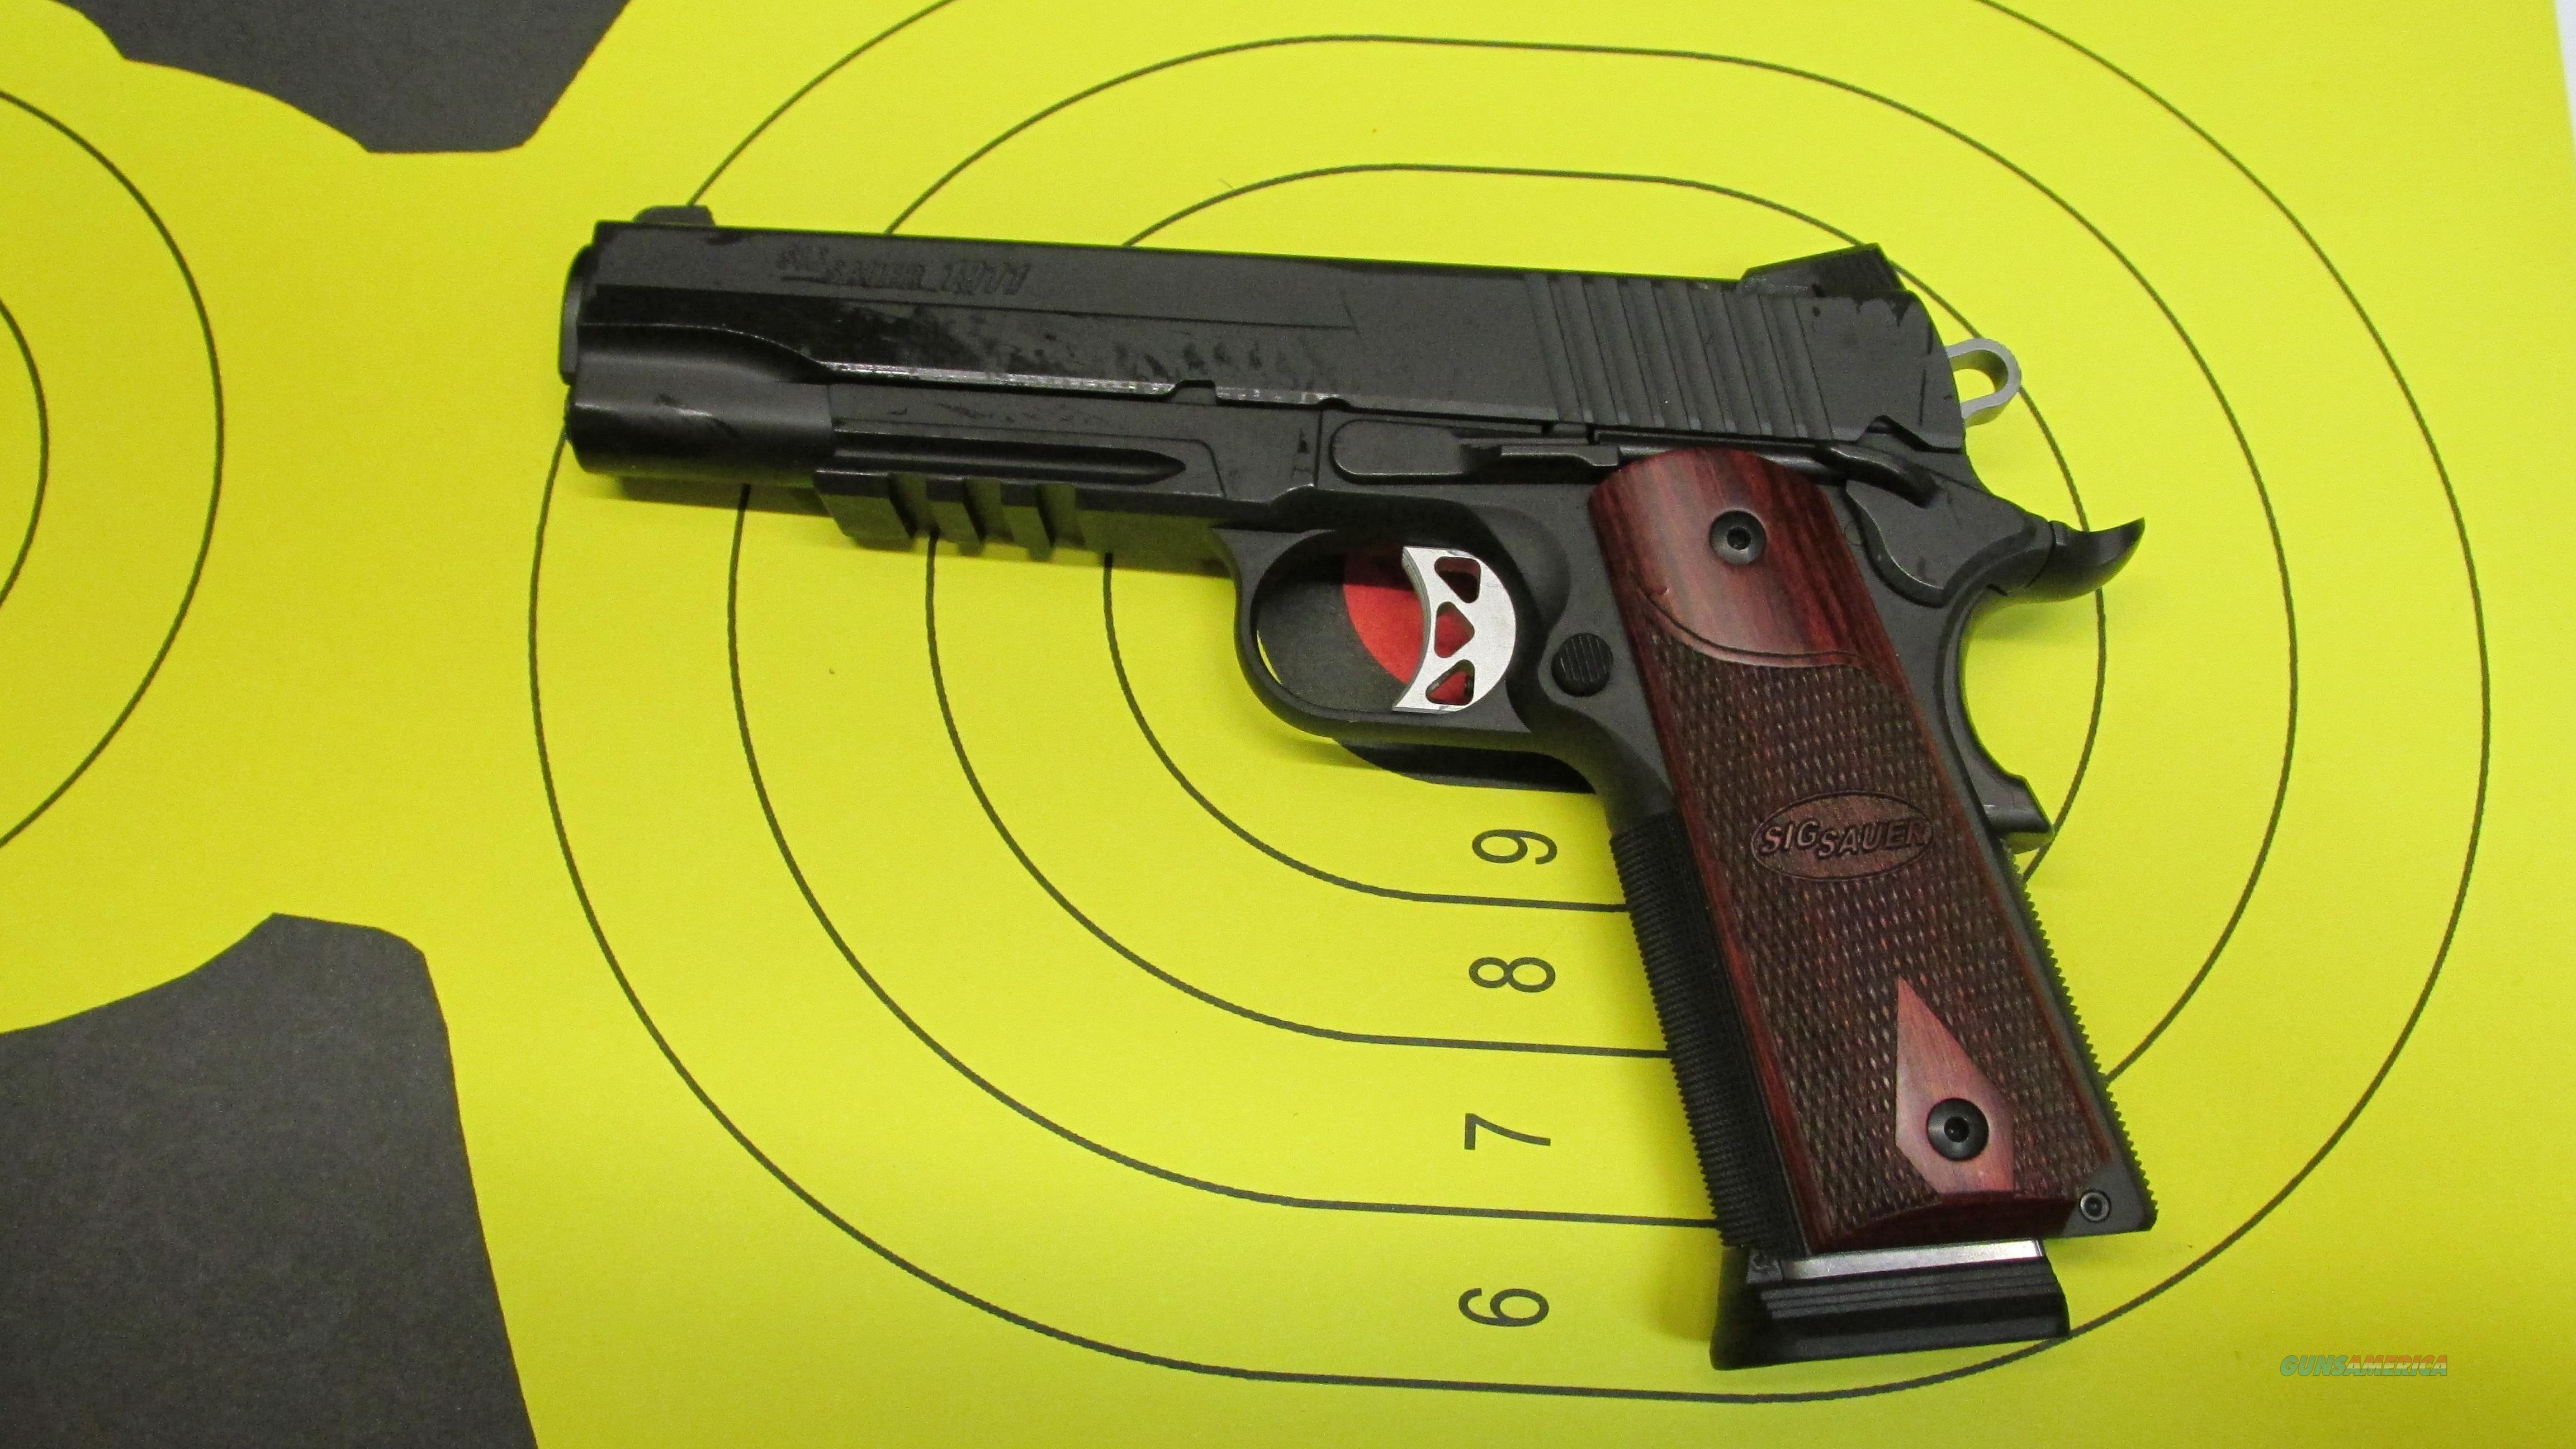 "SIG SAUER 1911R .45ACP 5"" BARREL 8 ROUND MAGAZINE (2)  Guns > Pistols > Sig - Sauer/Sigarms Pistols > 1911"